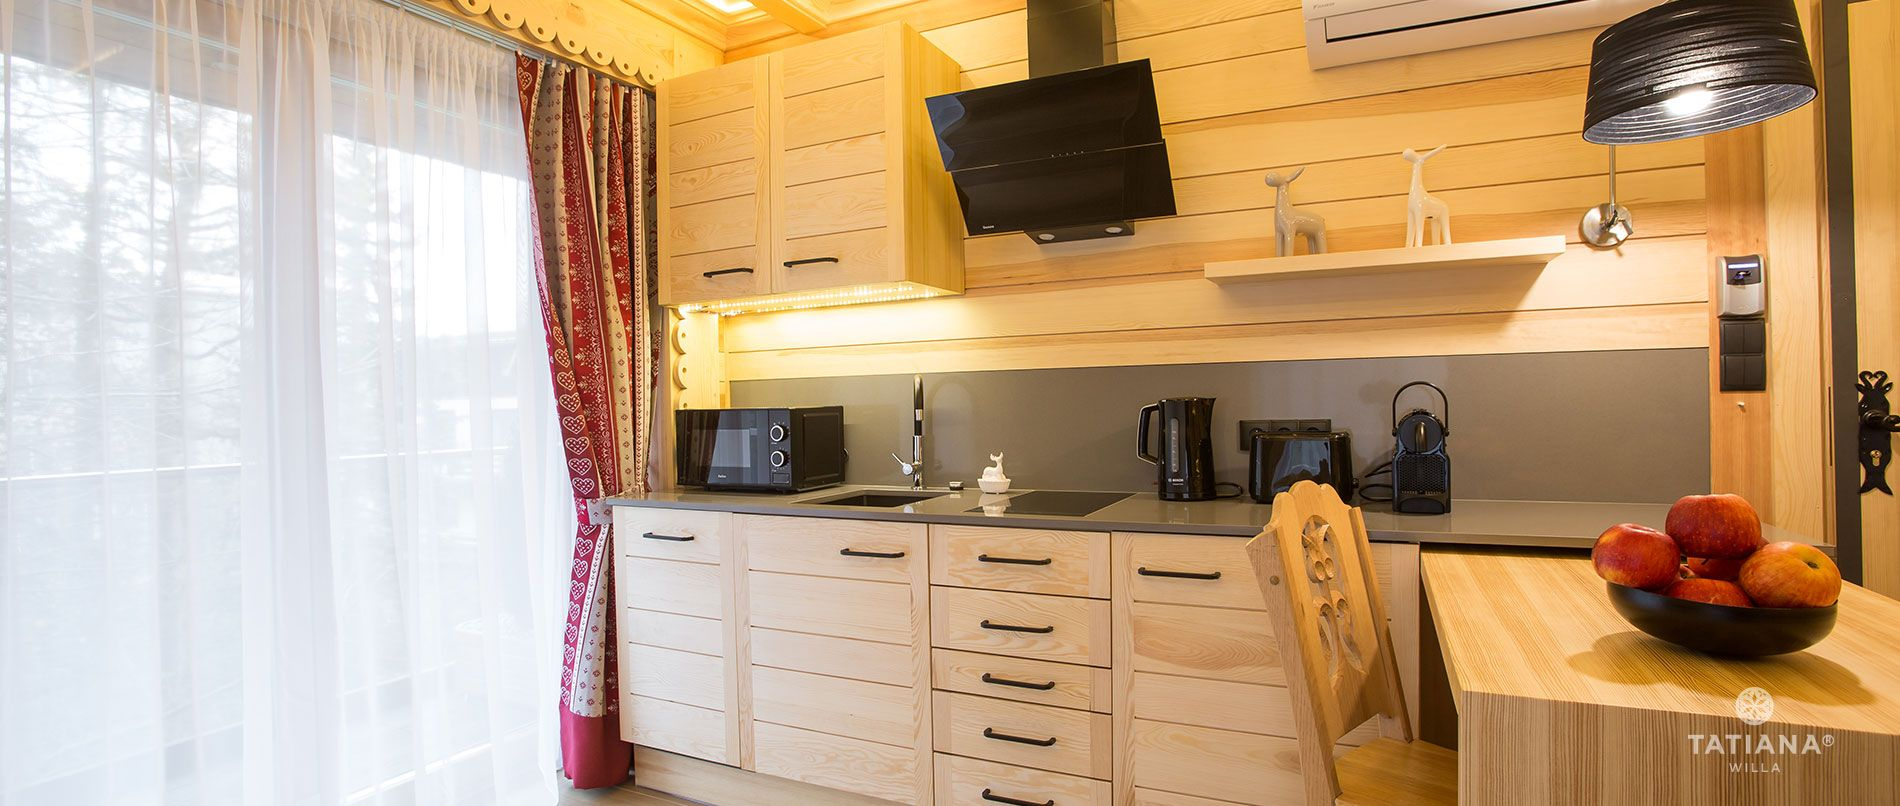 Apartament Alpejski - kuchnia